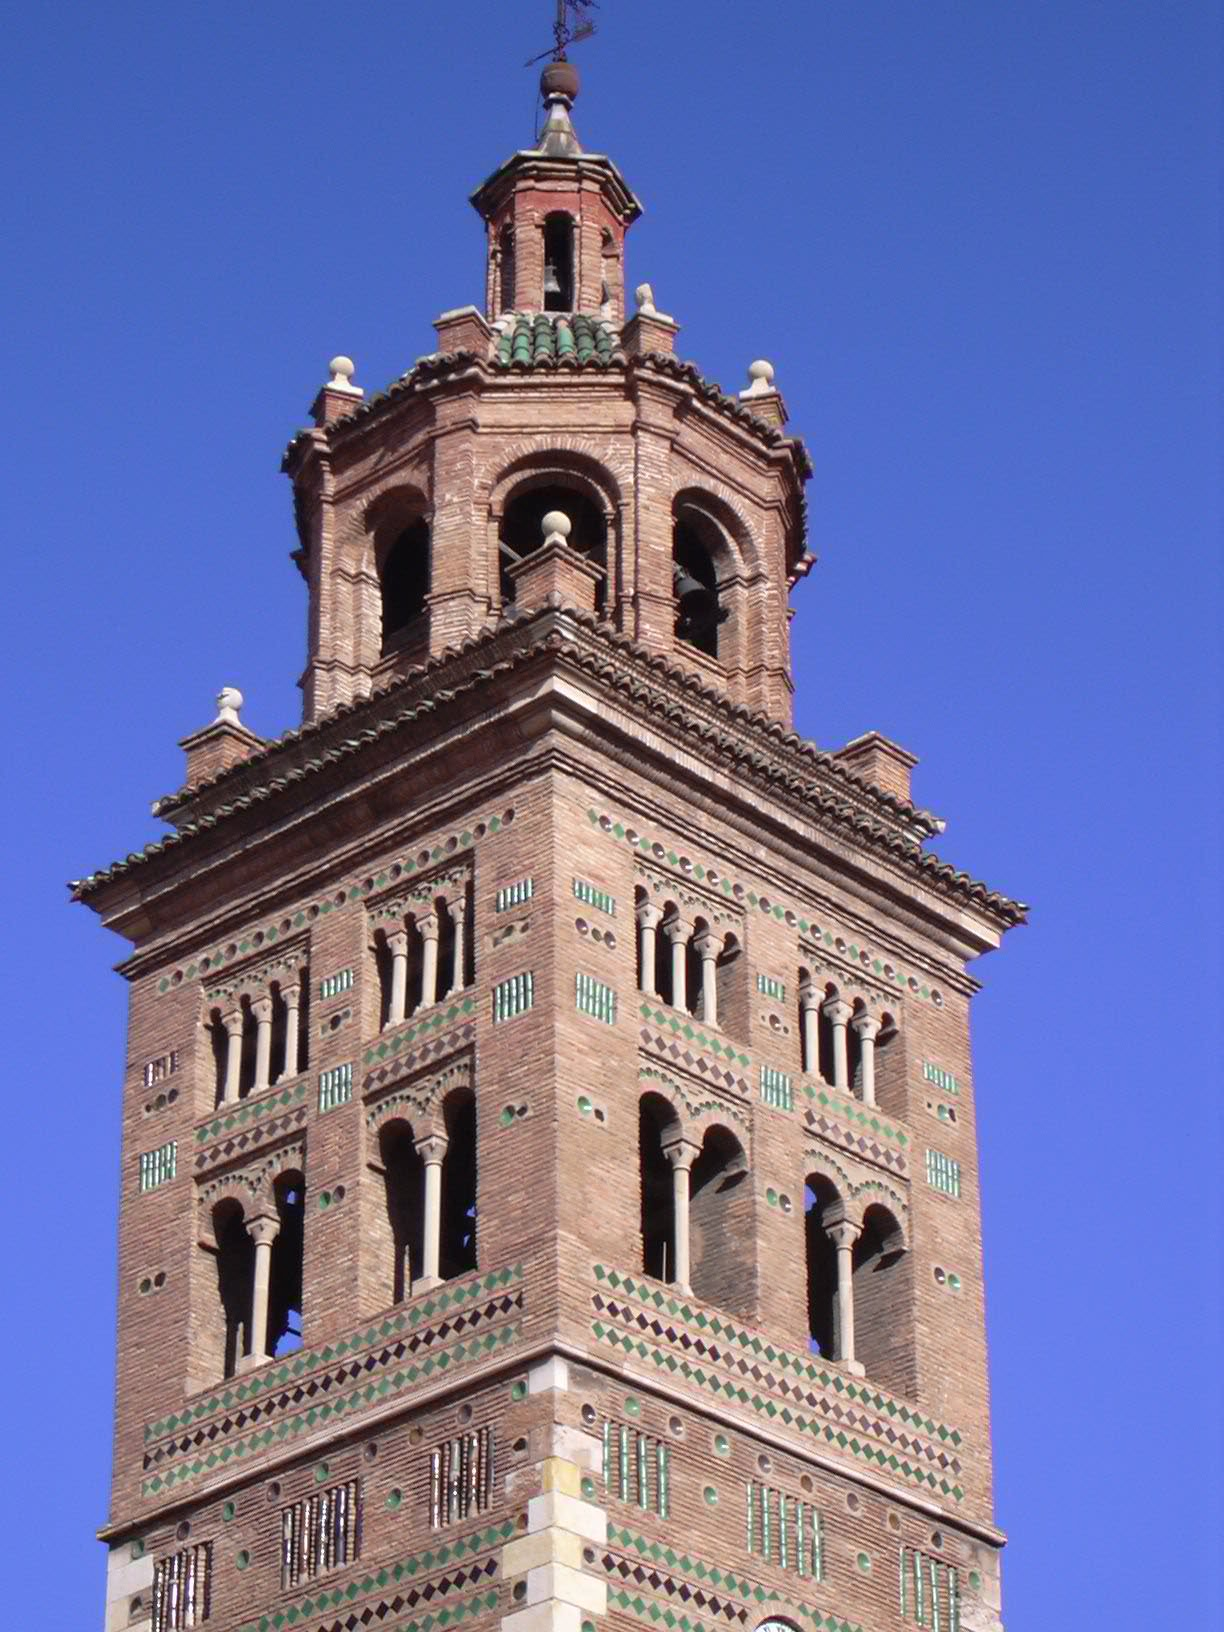 Архитектура мудехара в Арагоне (Теруэль)